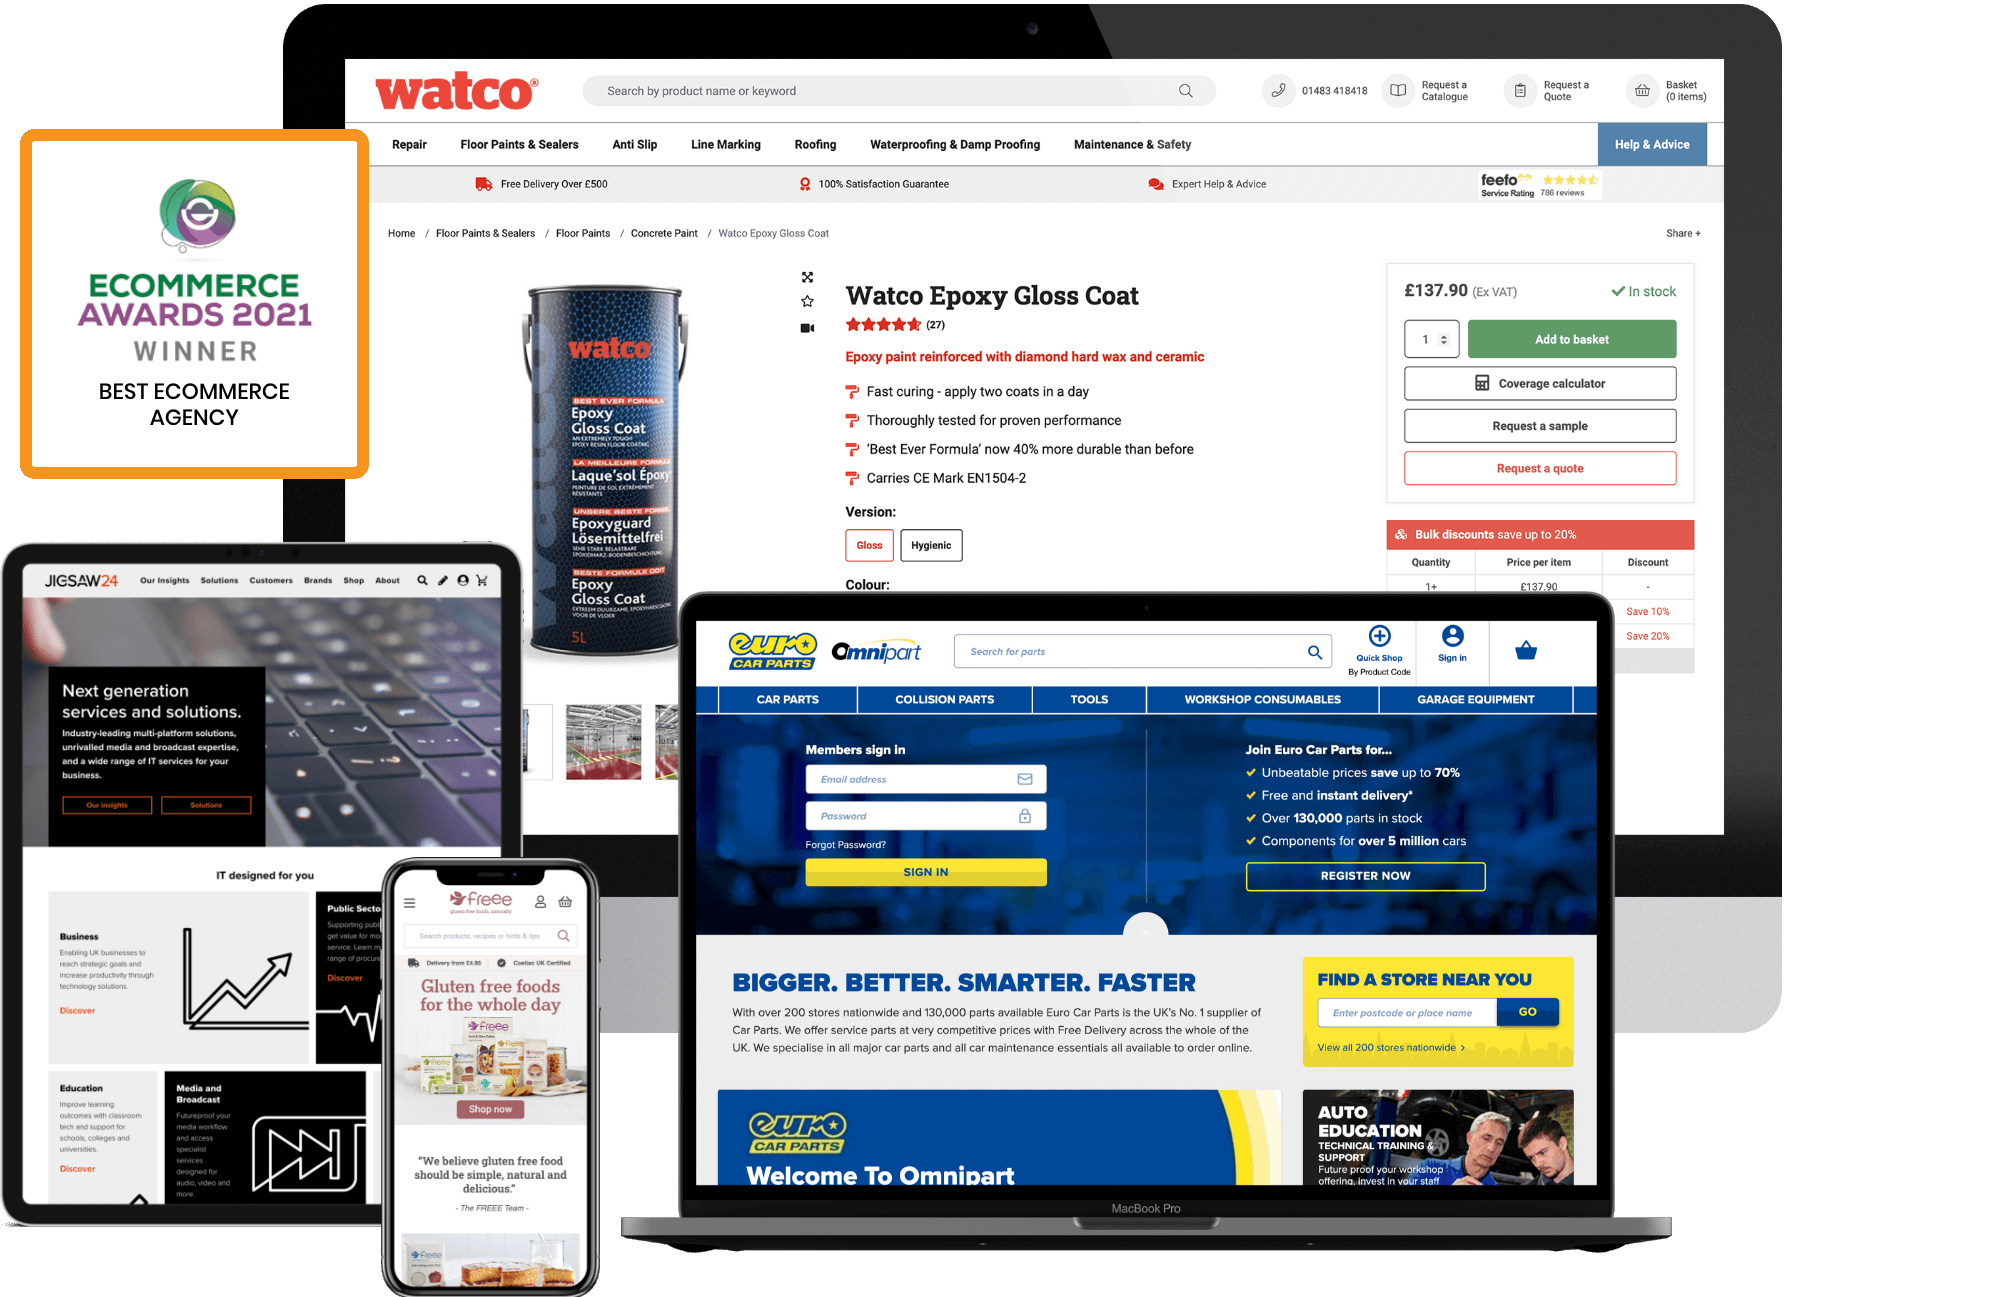 Watco desktop and mobile